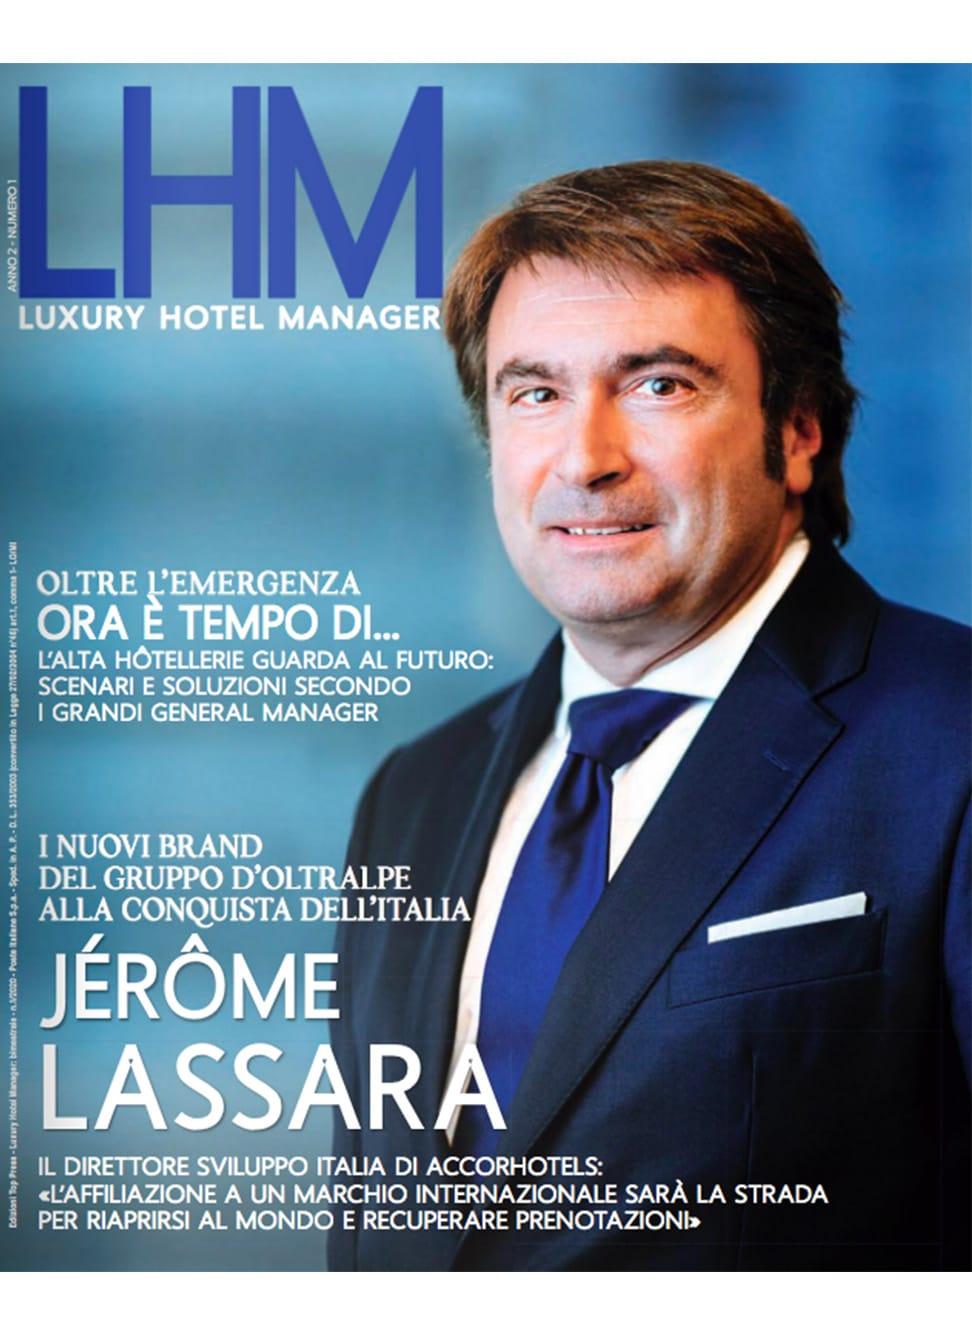 allmagazine - communication agency